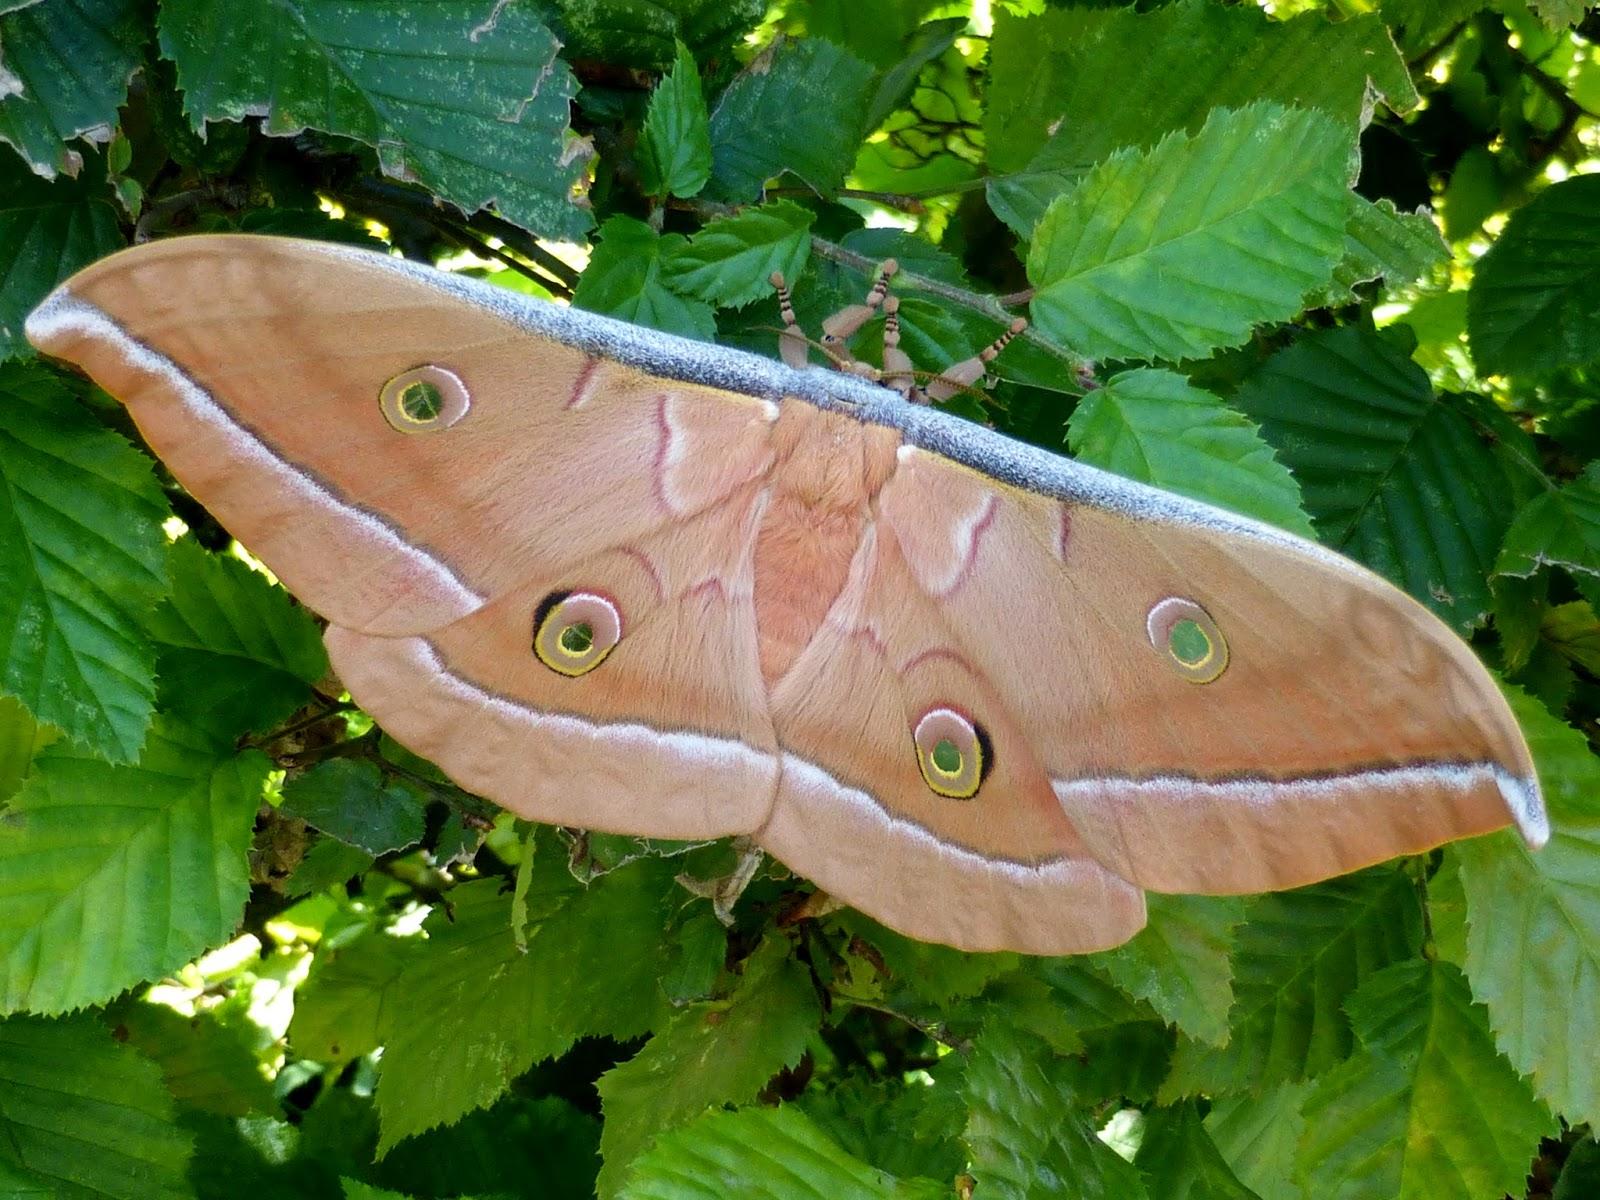 Antheraea pernyi female